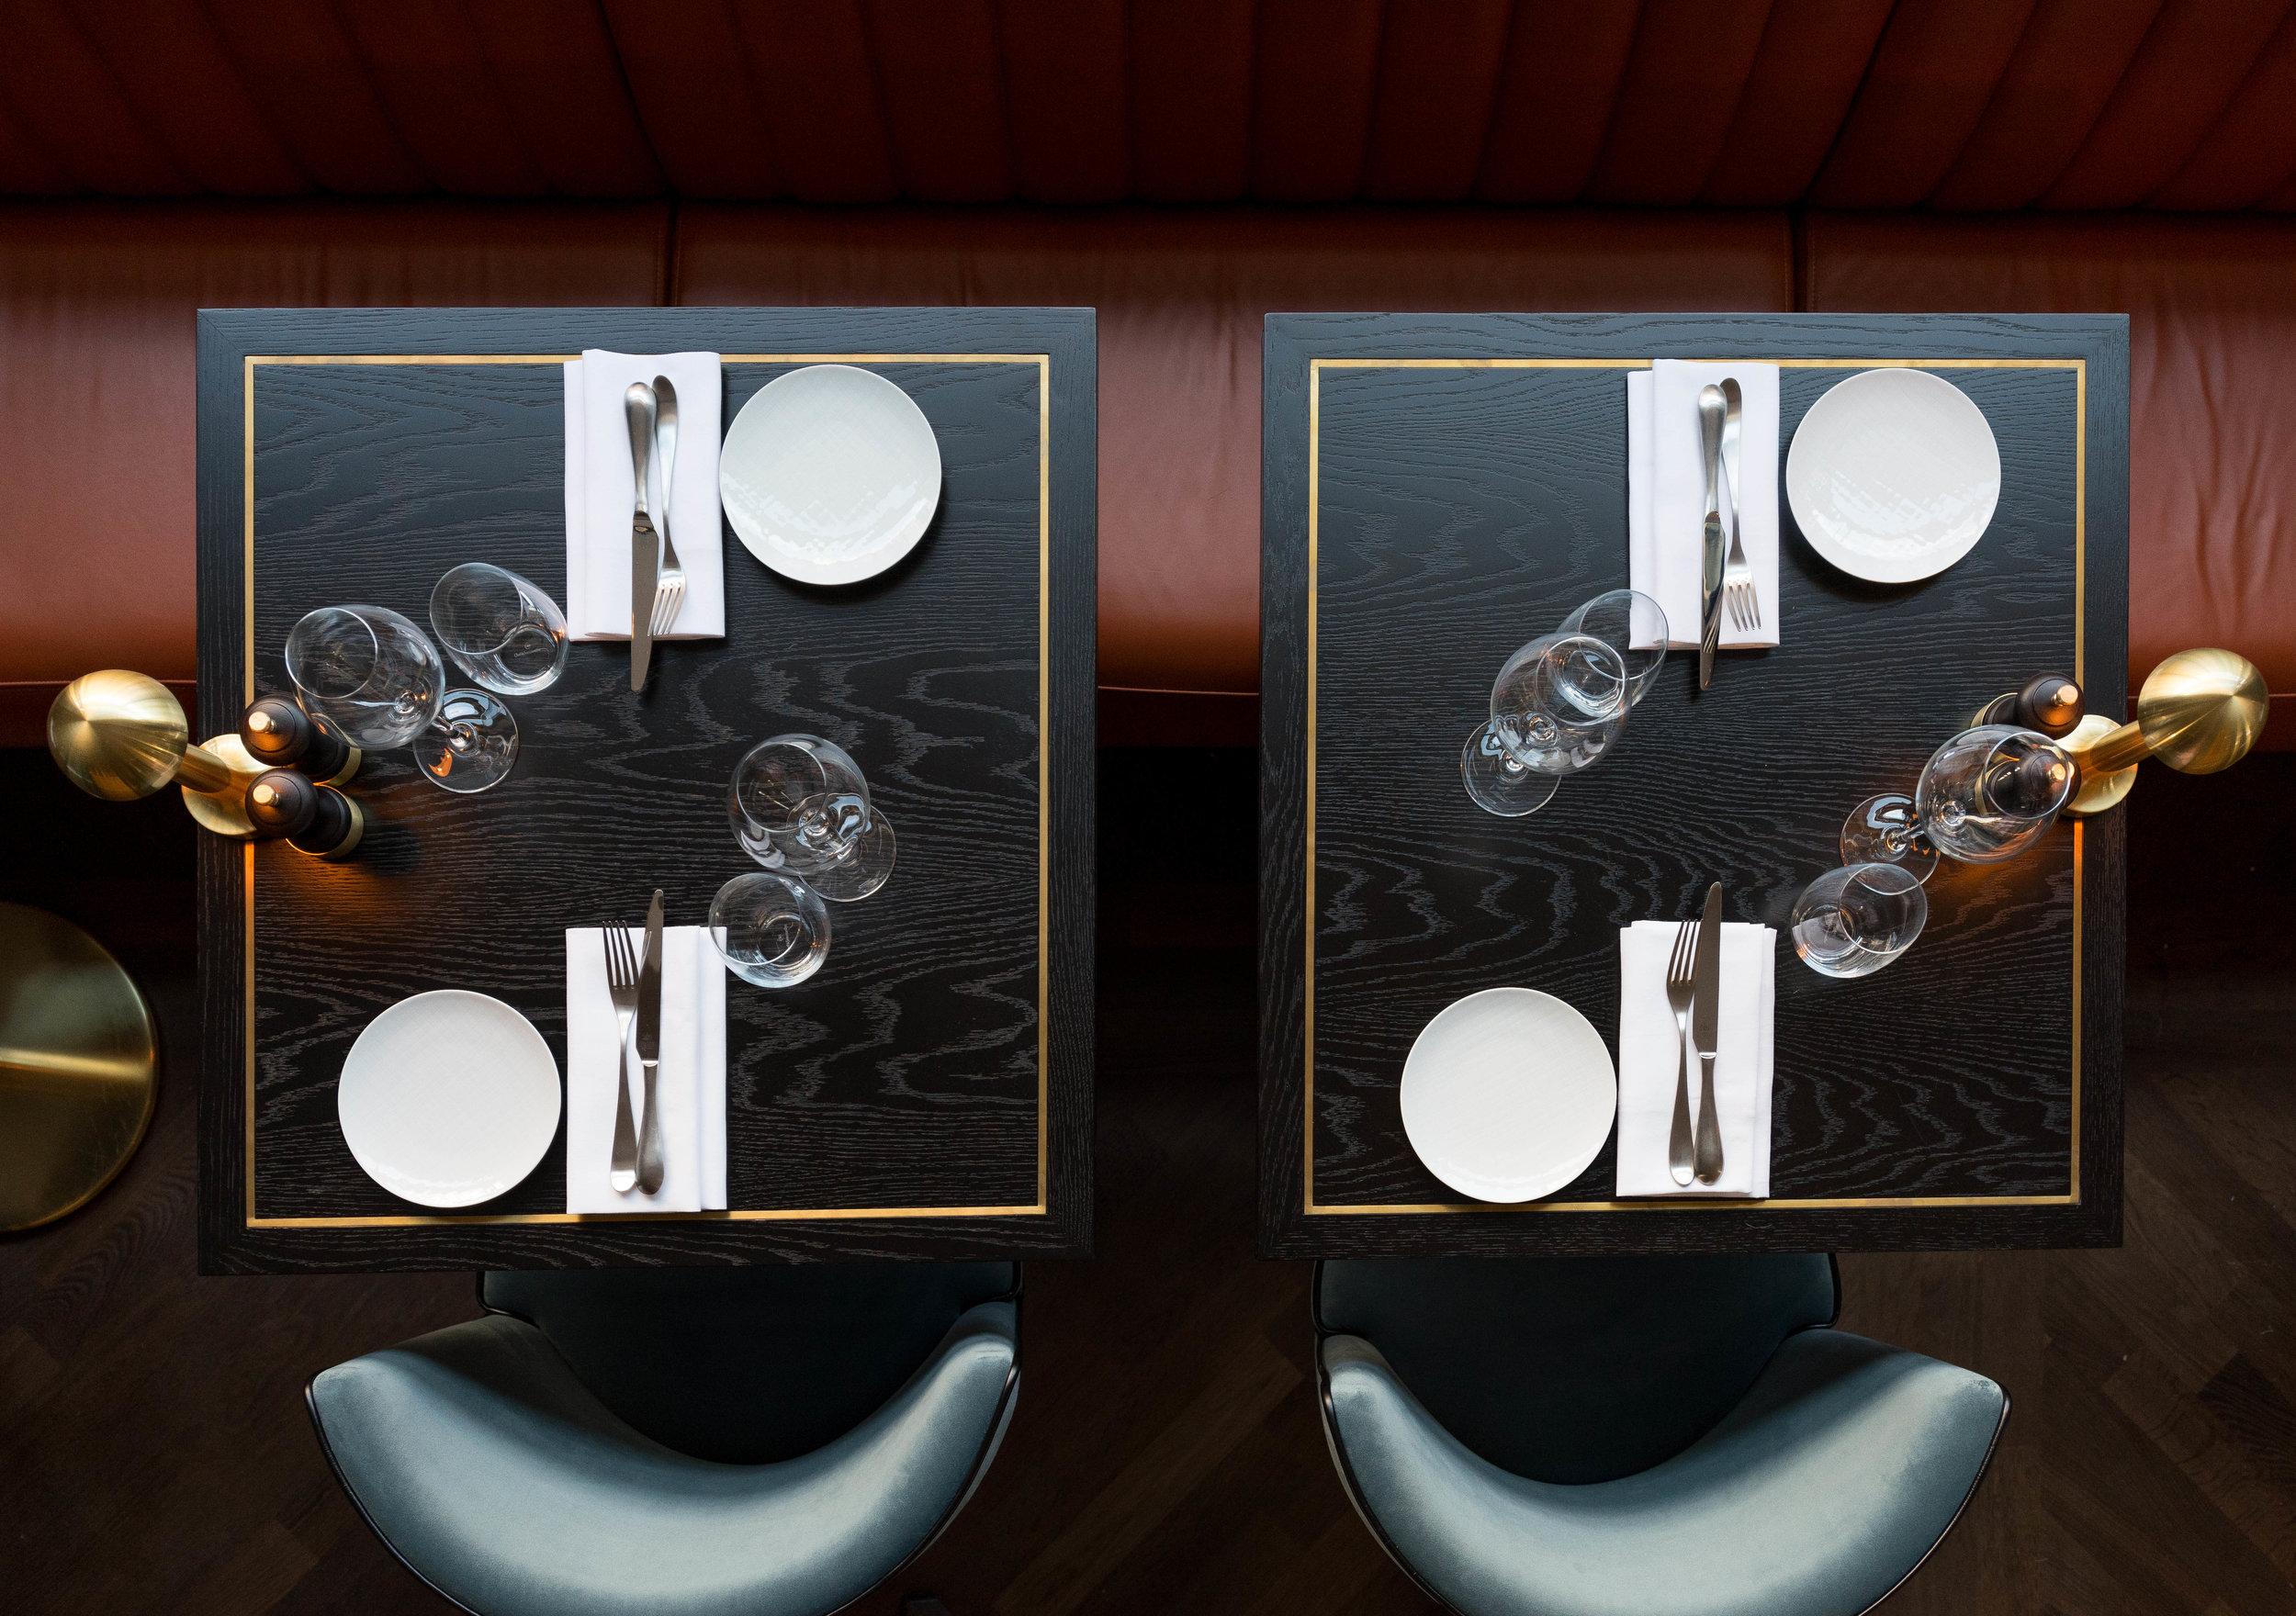 Trafalgar Dining Rooms review